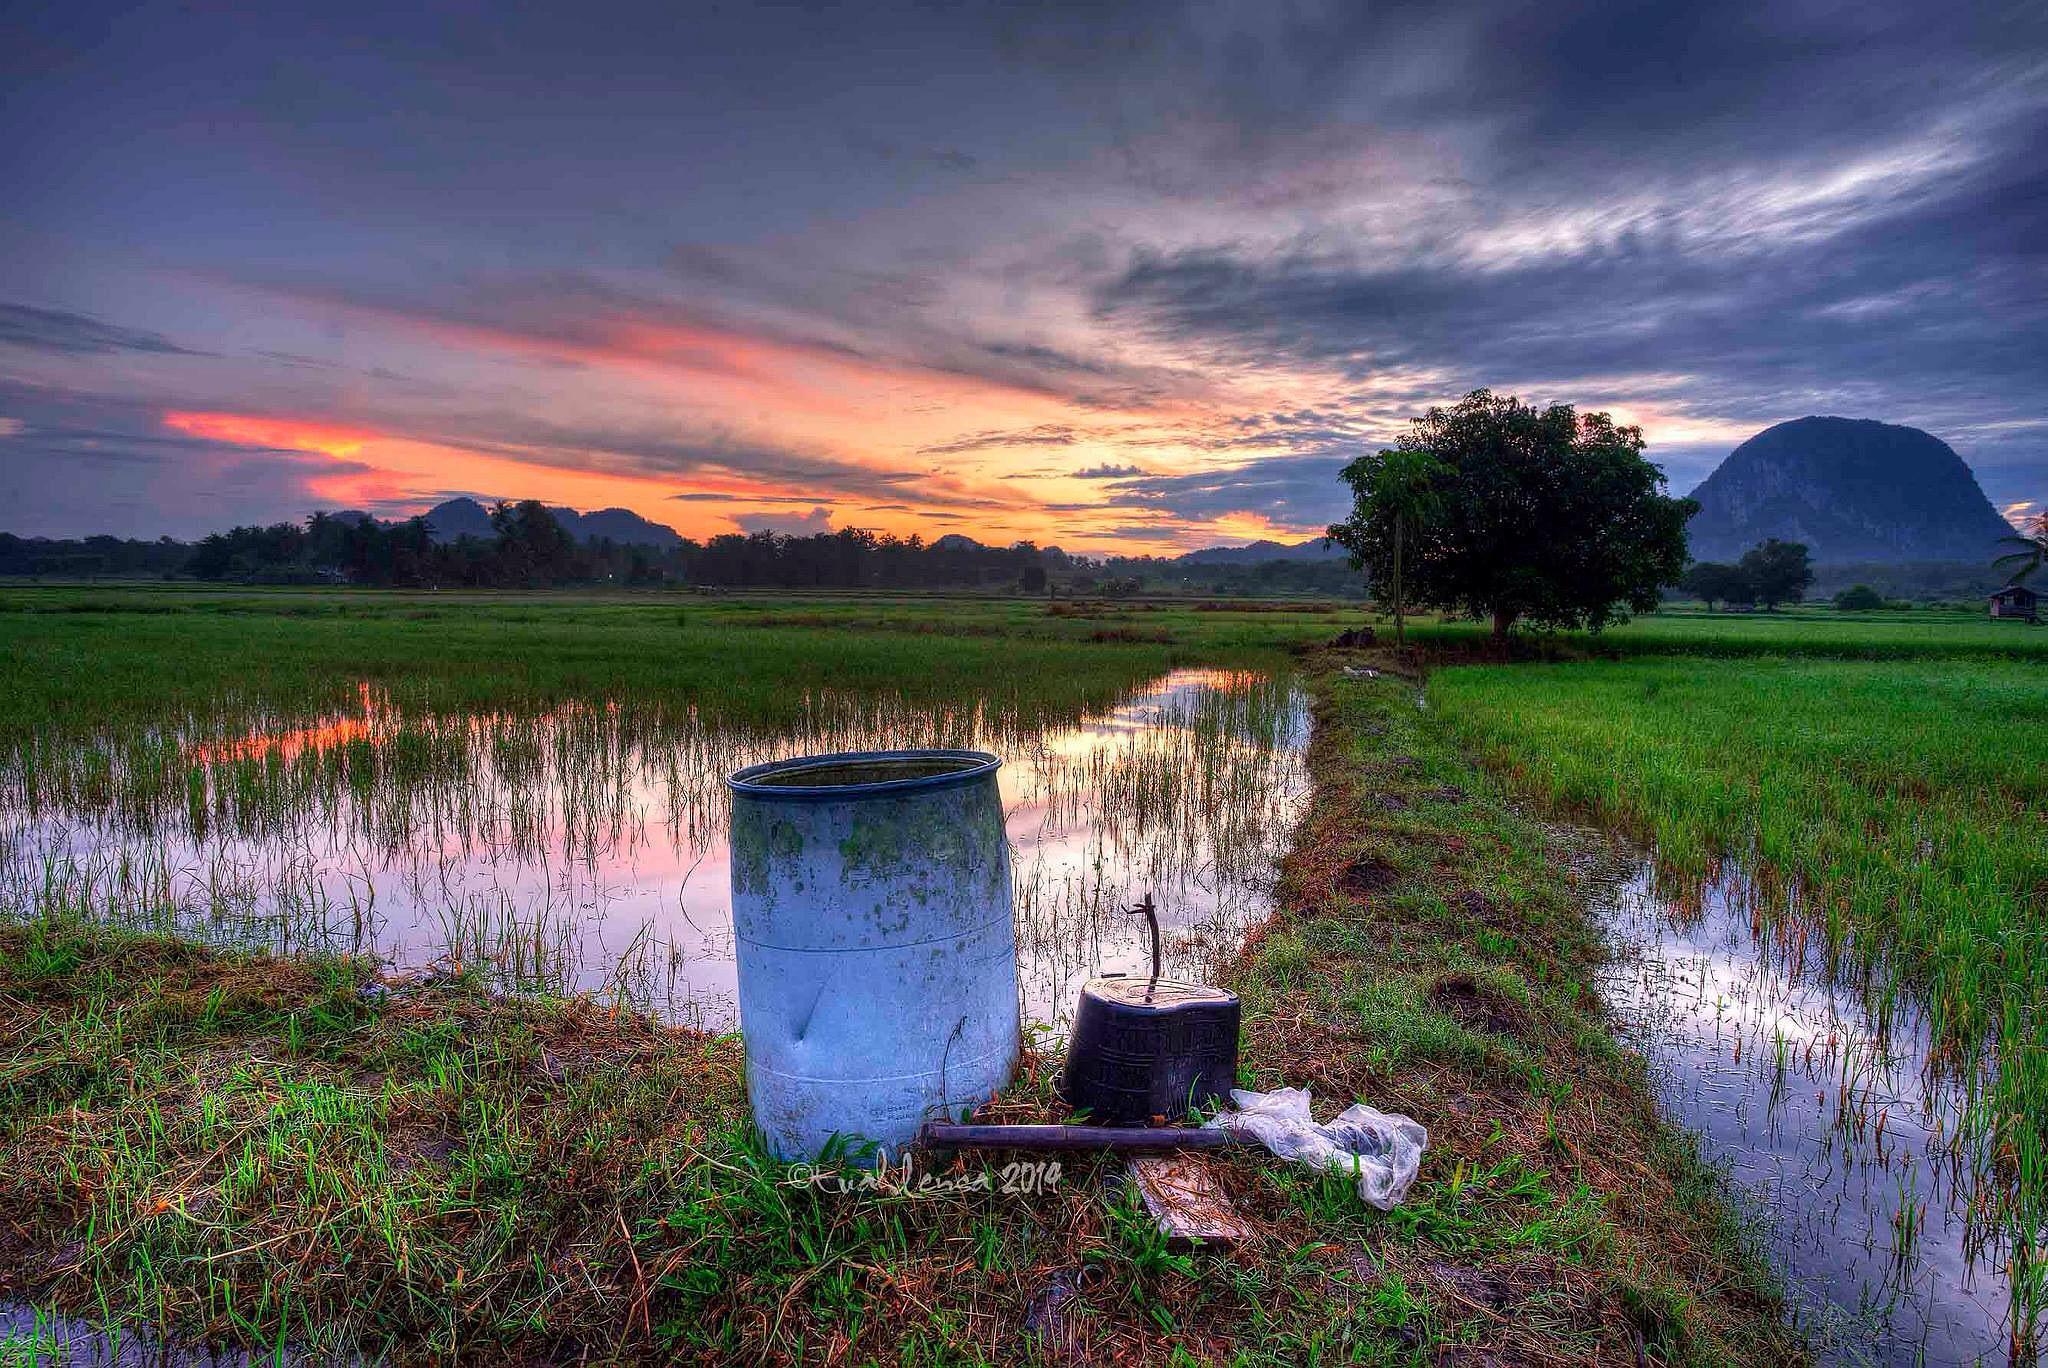 Glory morning by Tuahlensa Mki